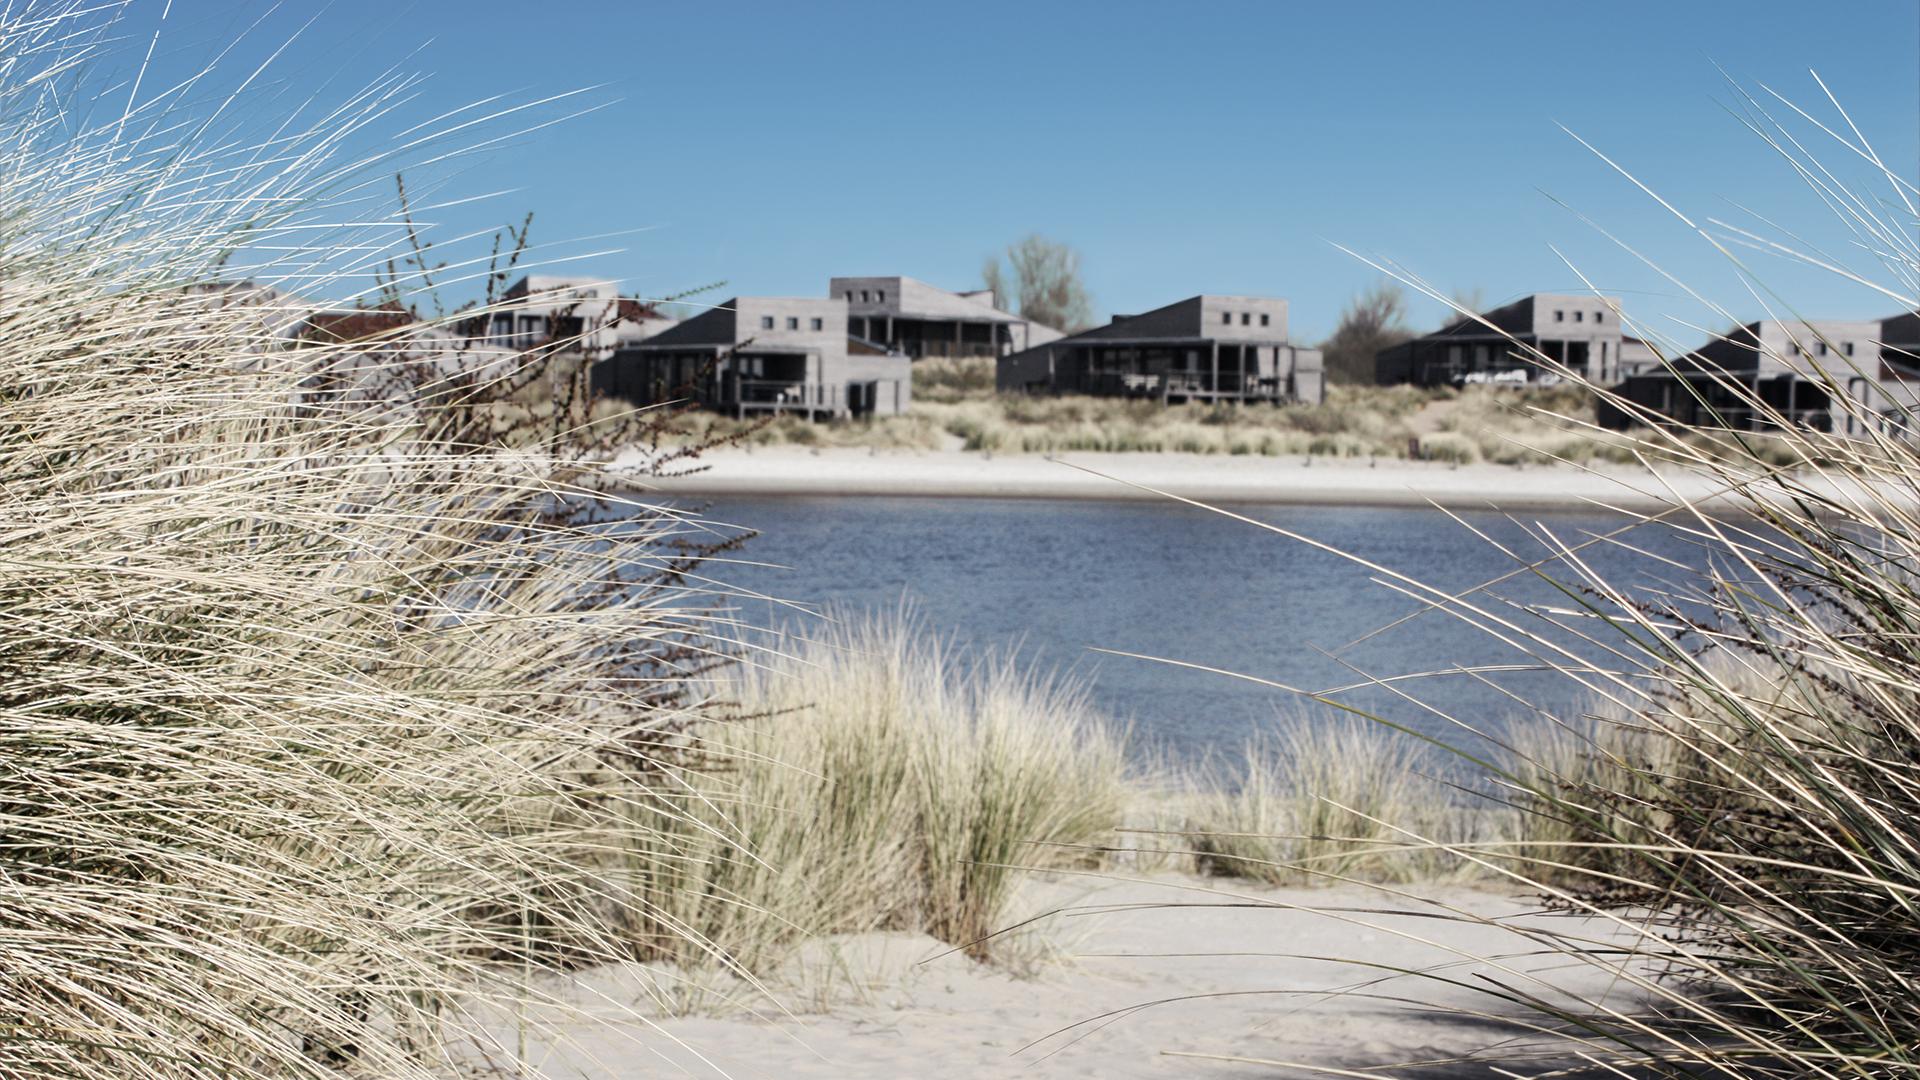 Punt West Hotel & Beach Resort (Brouwersdam)